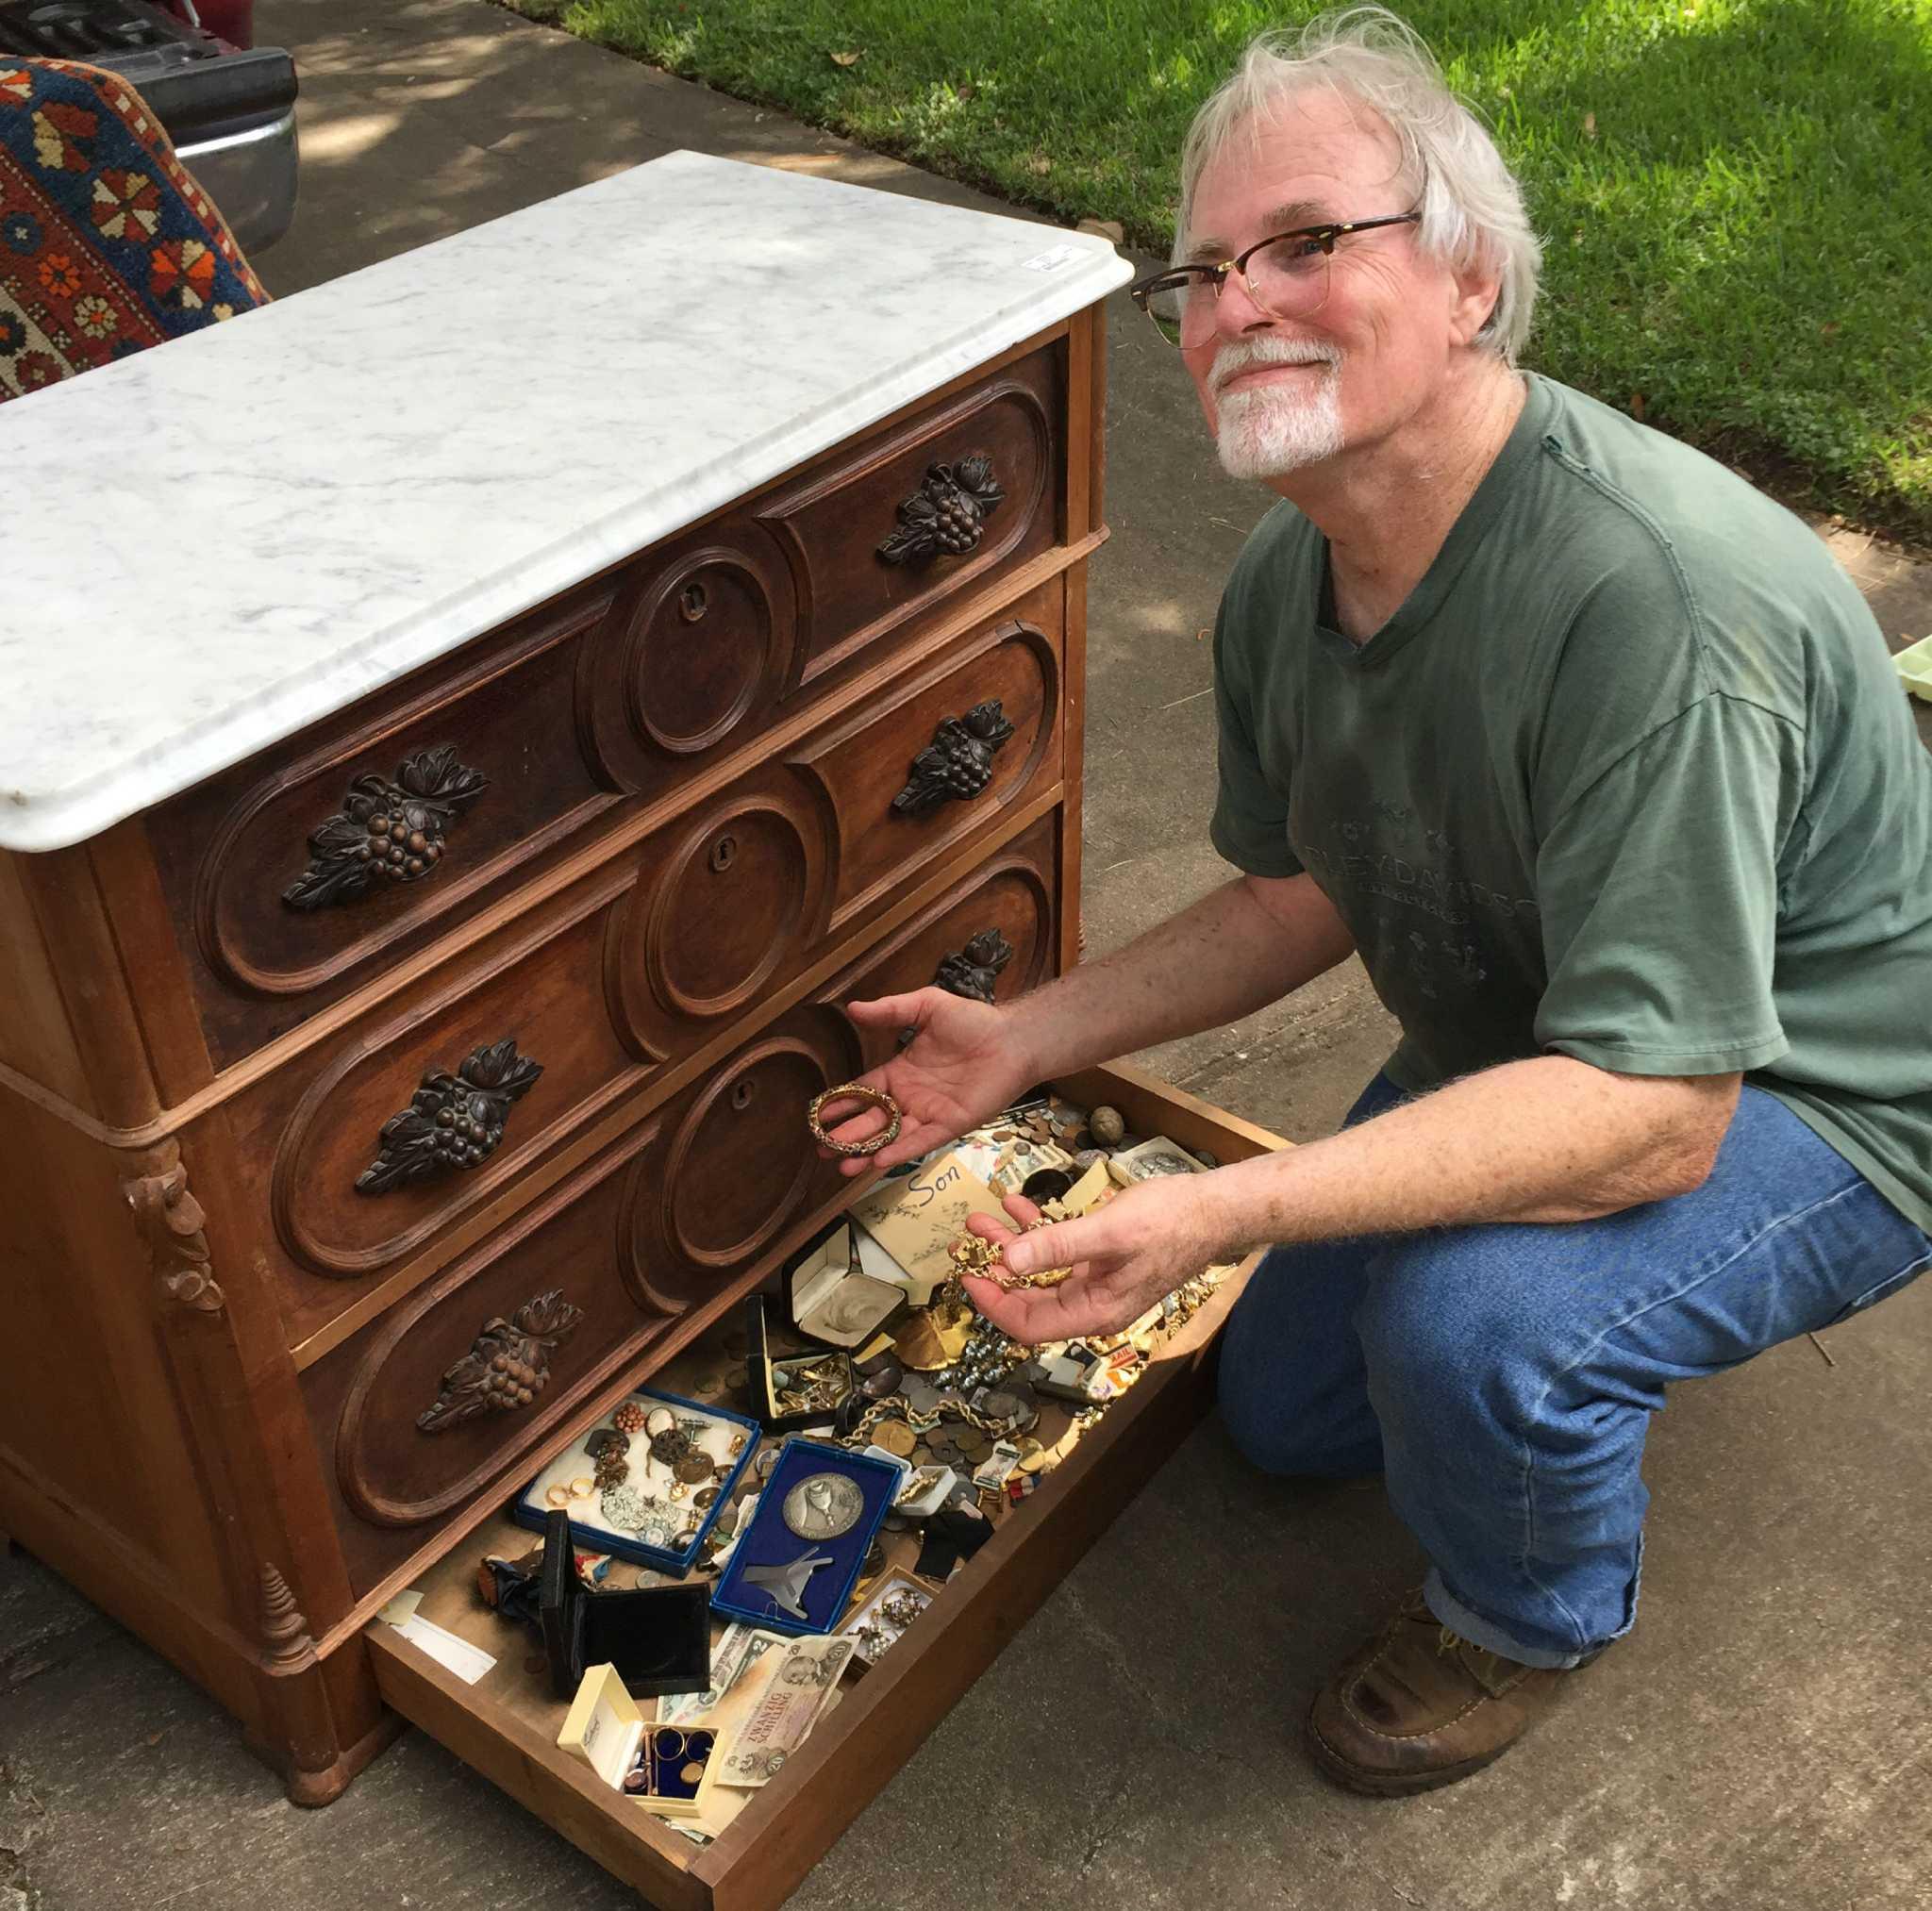 Secret Drawer In Estate Chest Yields Trove Of Forgotten